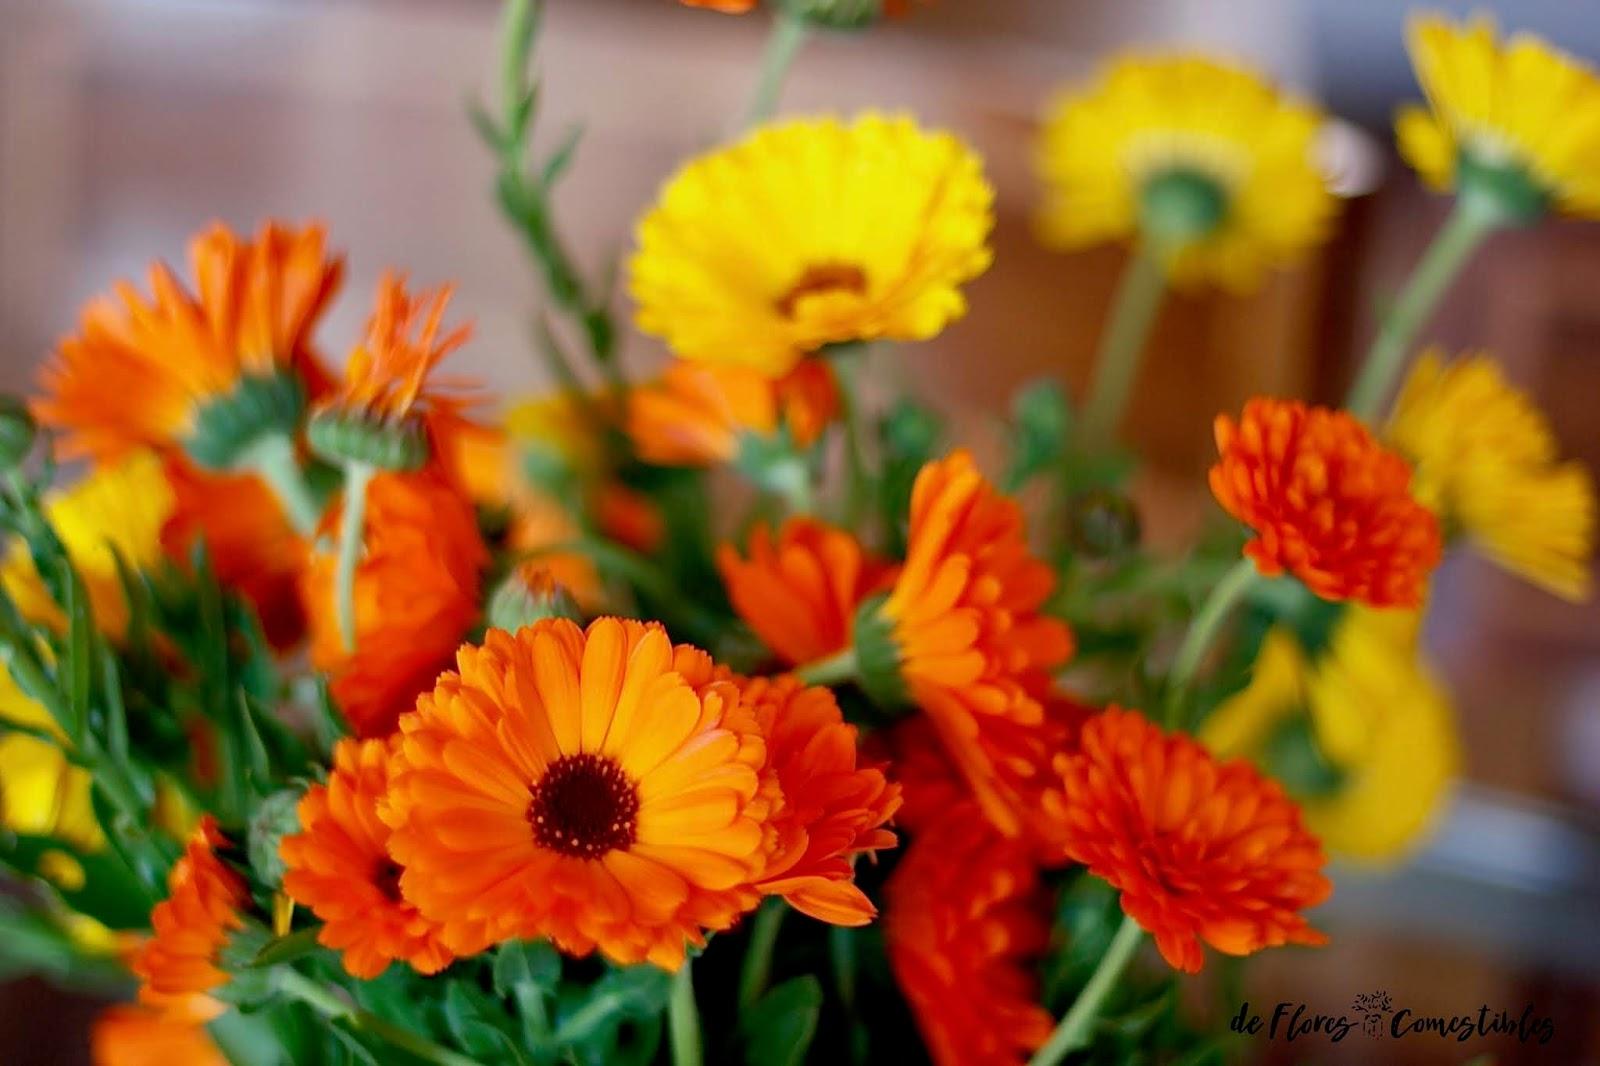 Flor caléndula | De flores comestibles